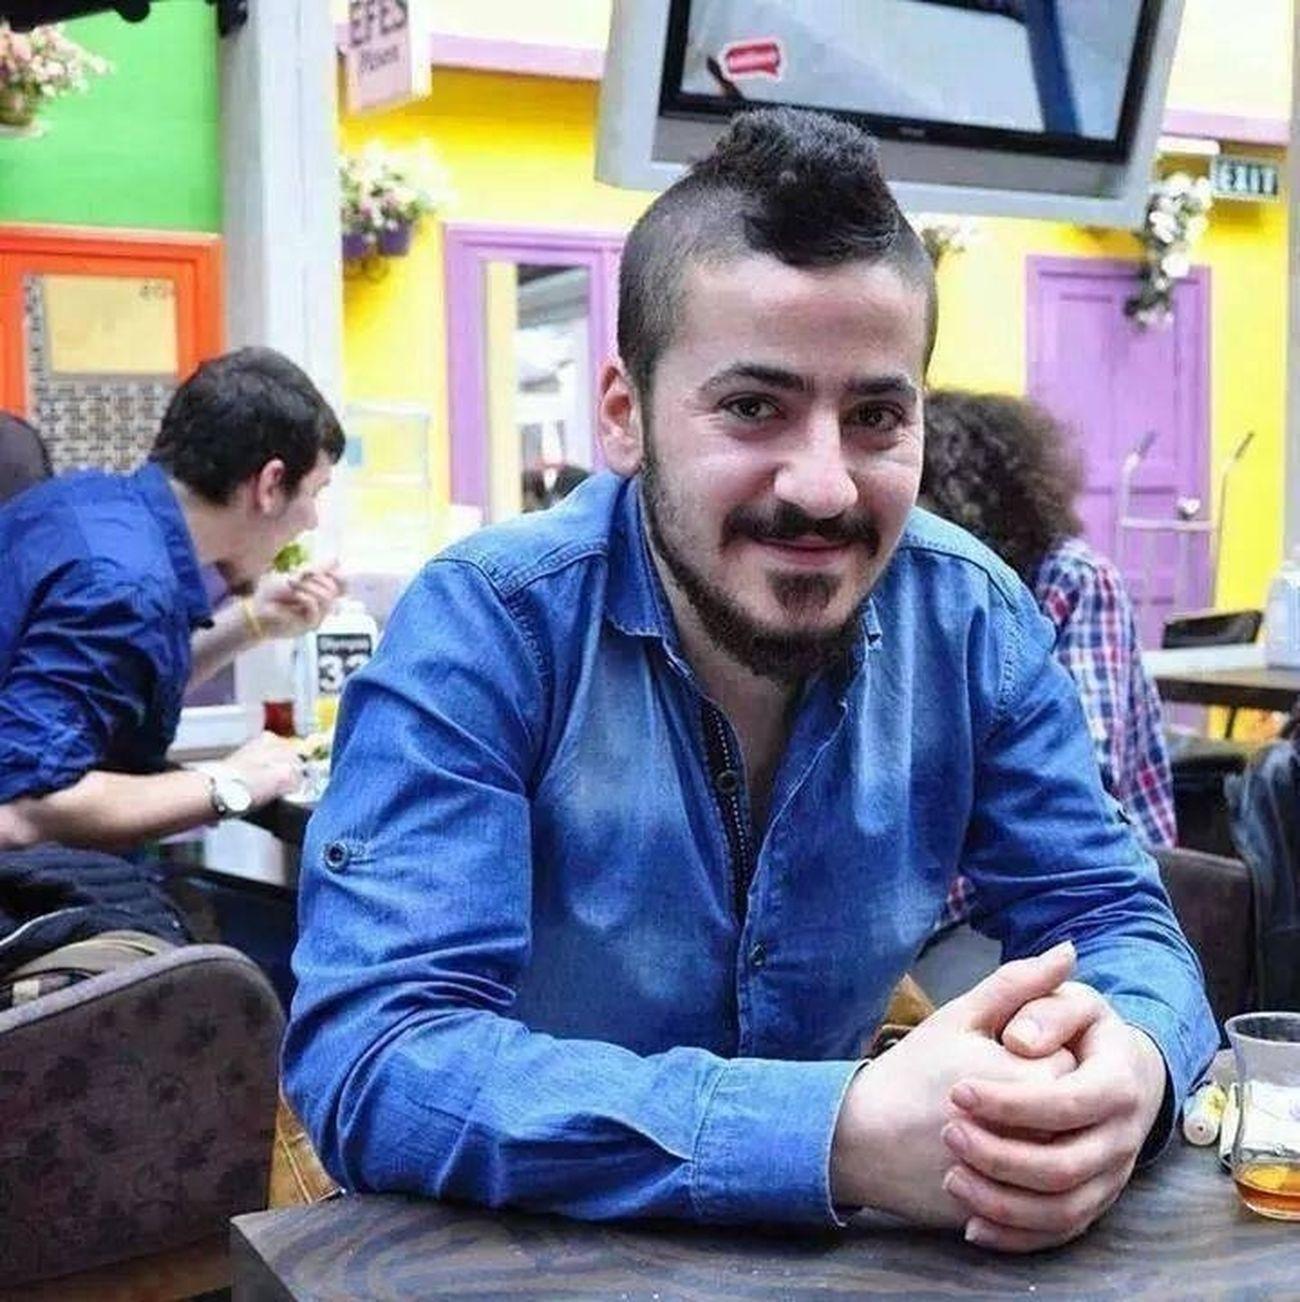 Aliismailkorkmaz Aliismailkorkmazolumsuzdur Turkey